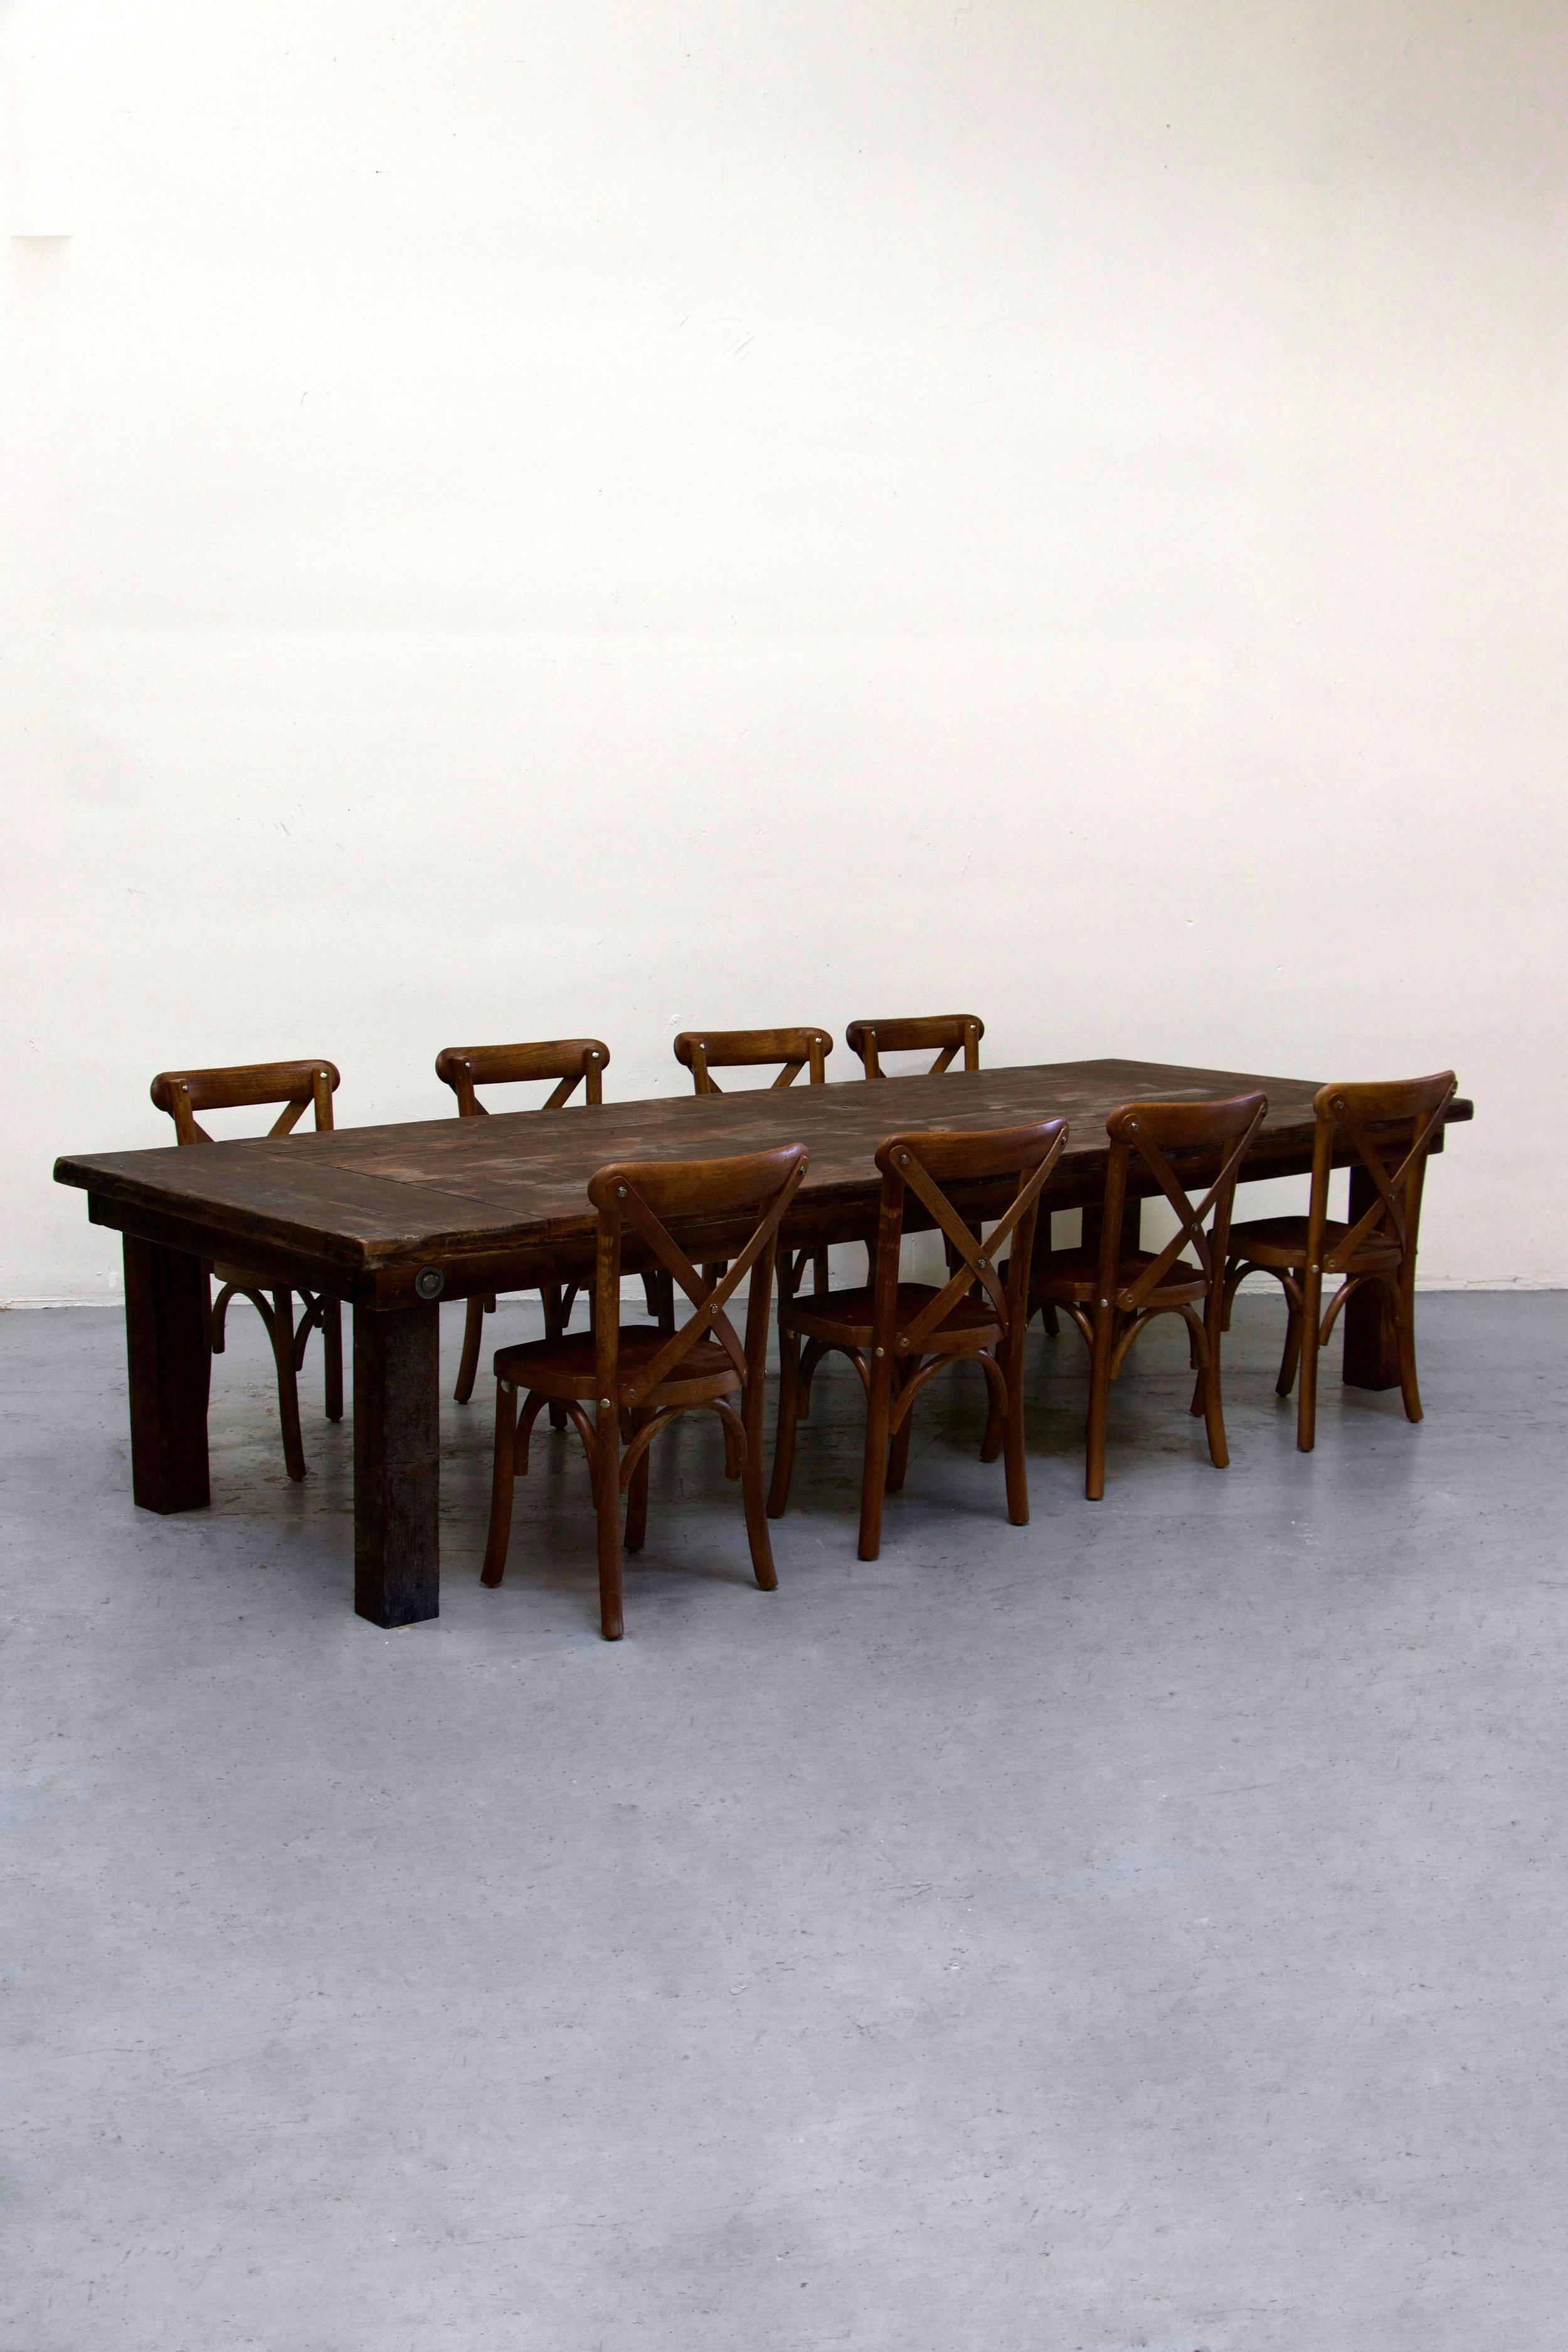 $130 1 Kids Mahogany Farm Table w/ 8 Cross-Back Chairs